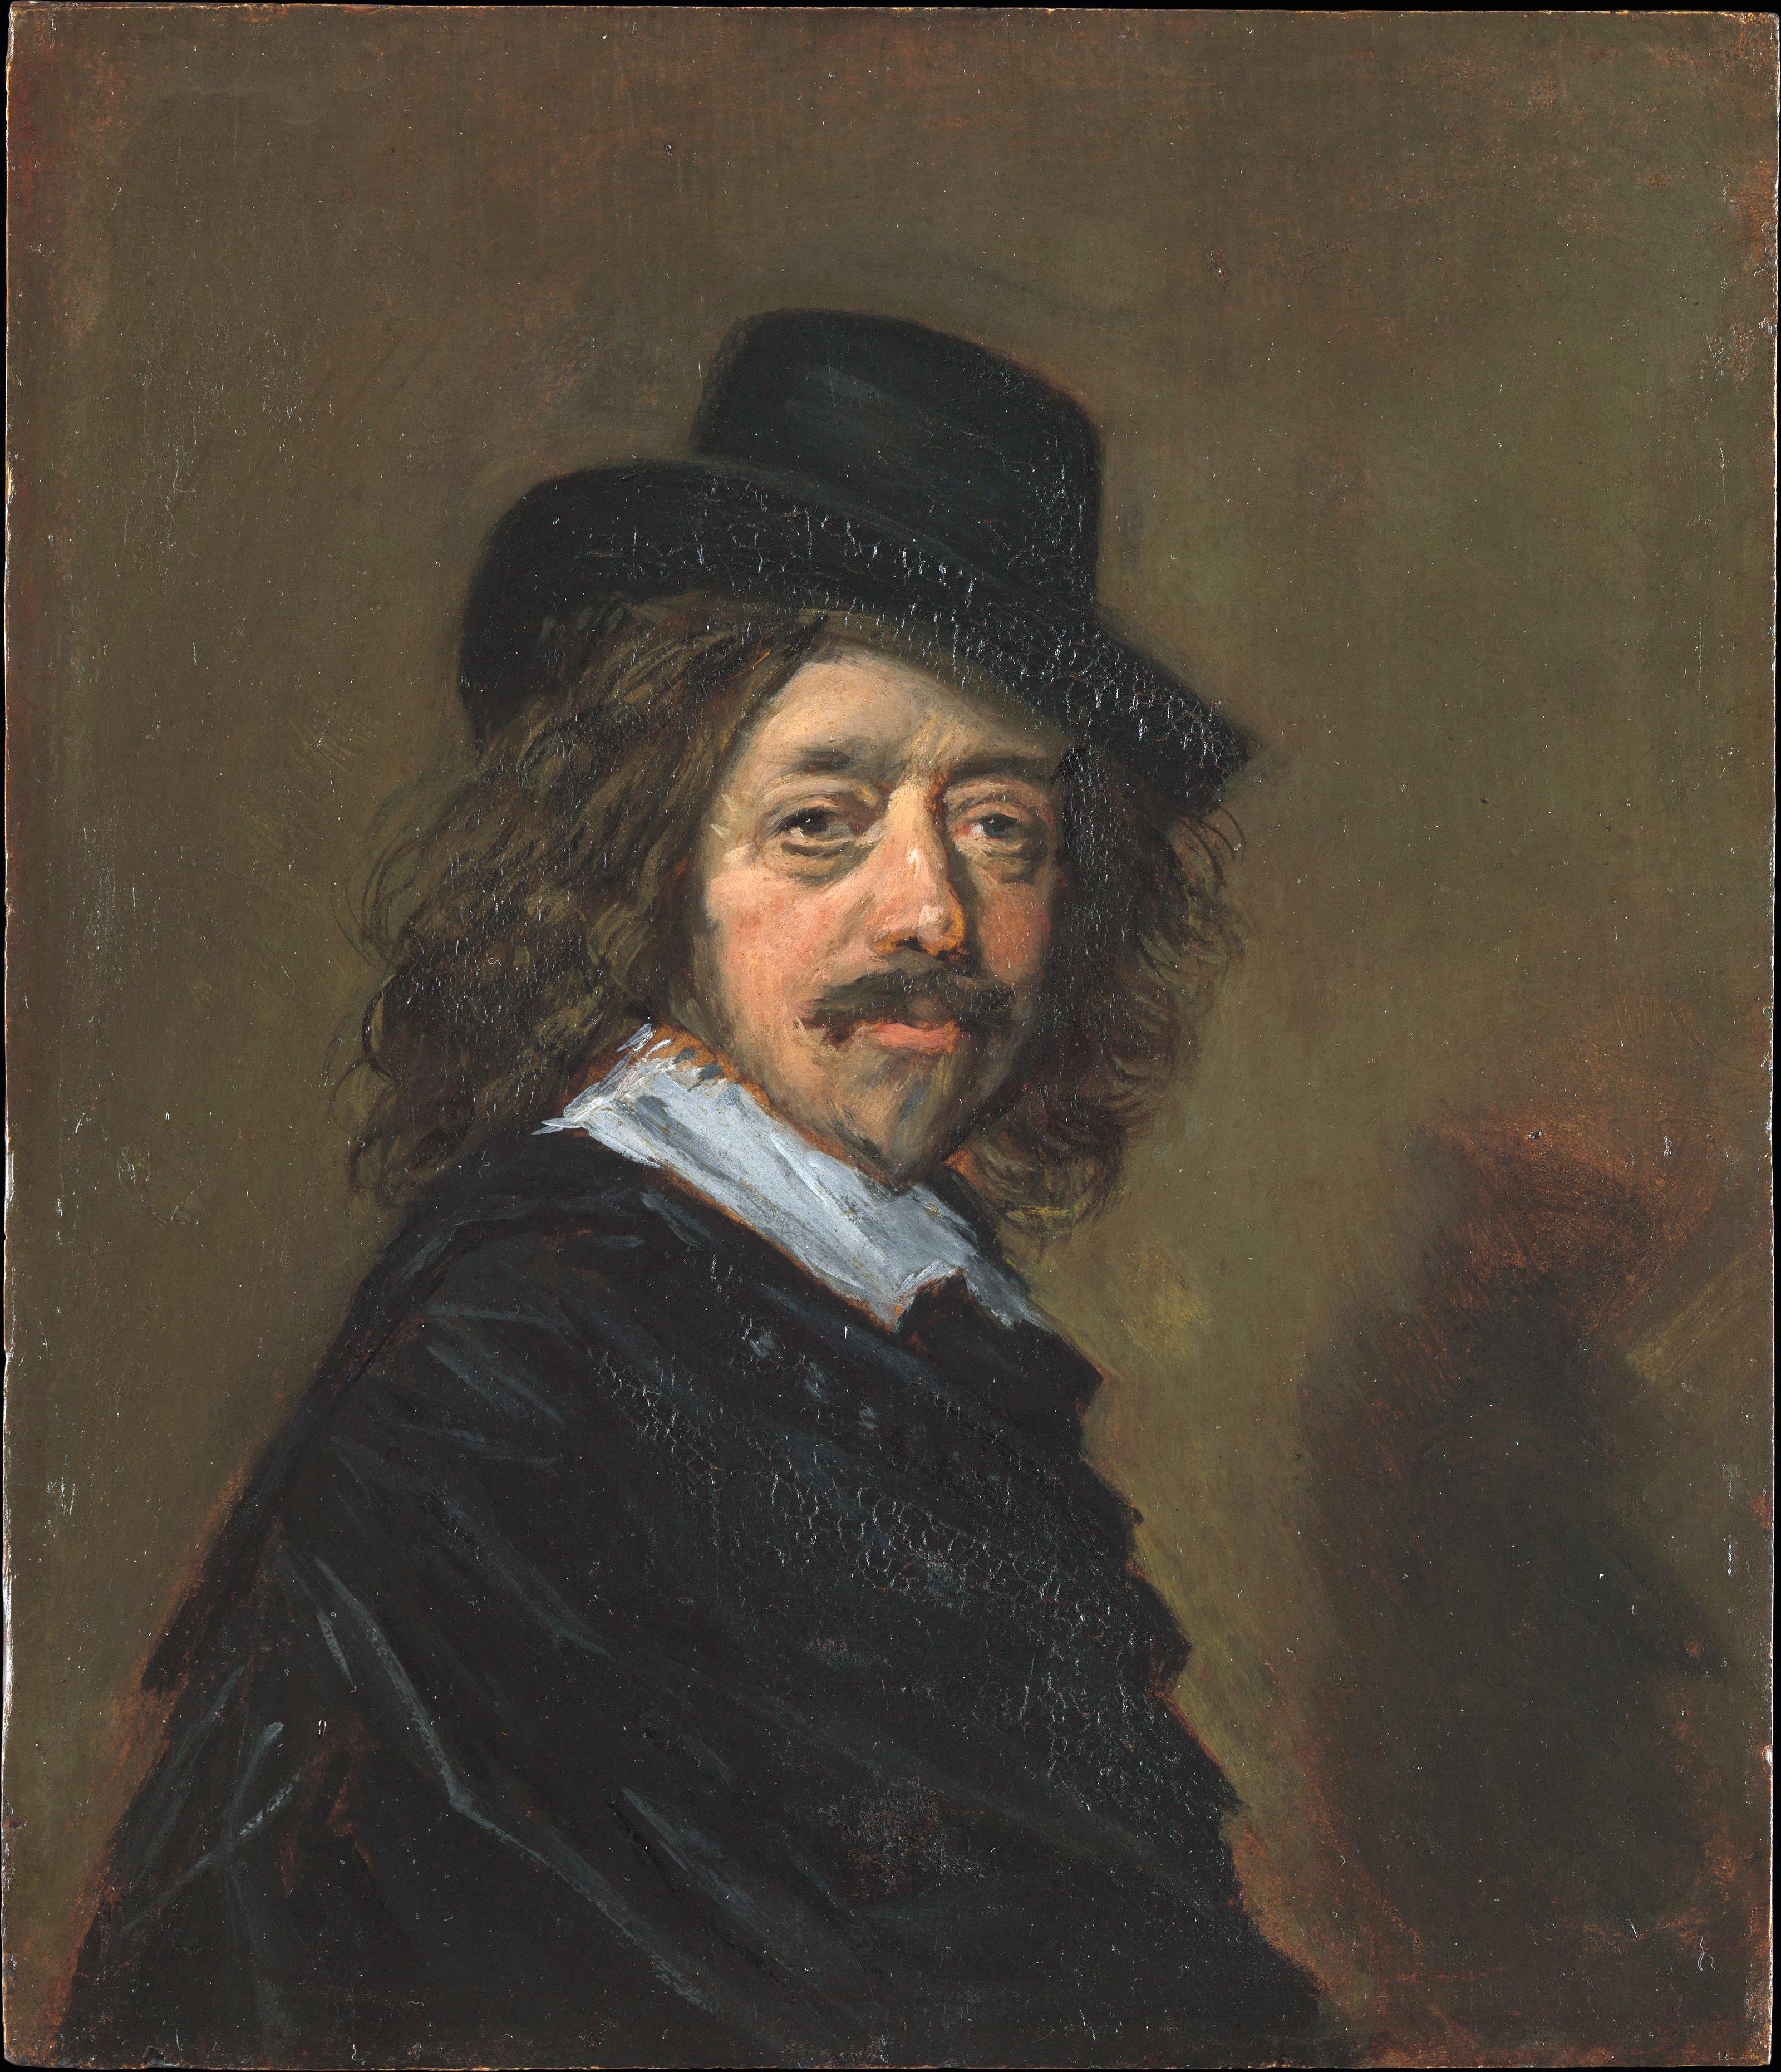 Frans Hals – Wikipédia, a enciclopédia livre